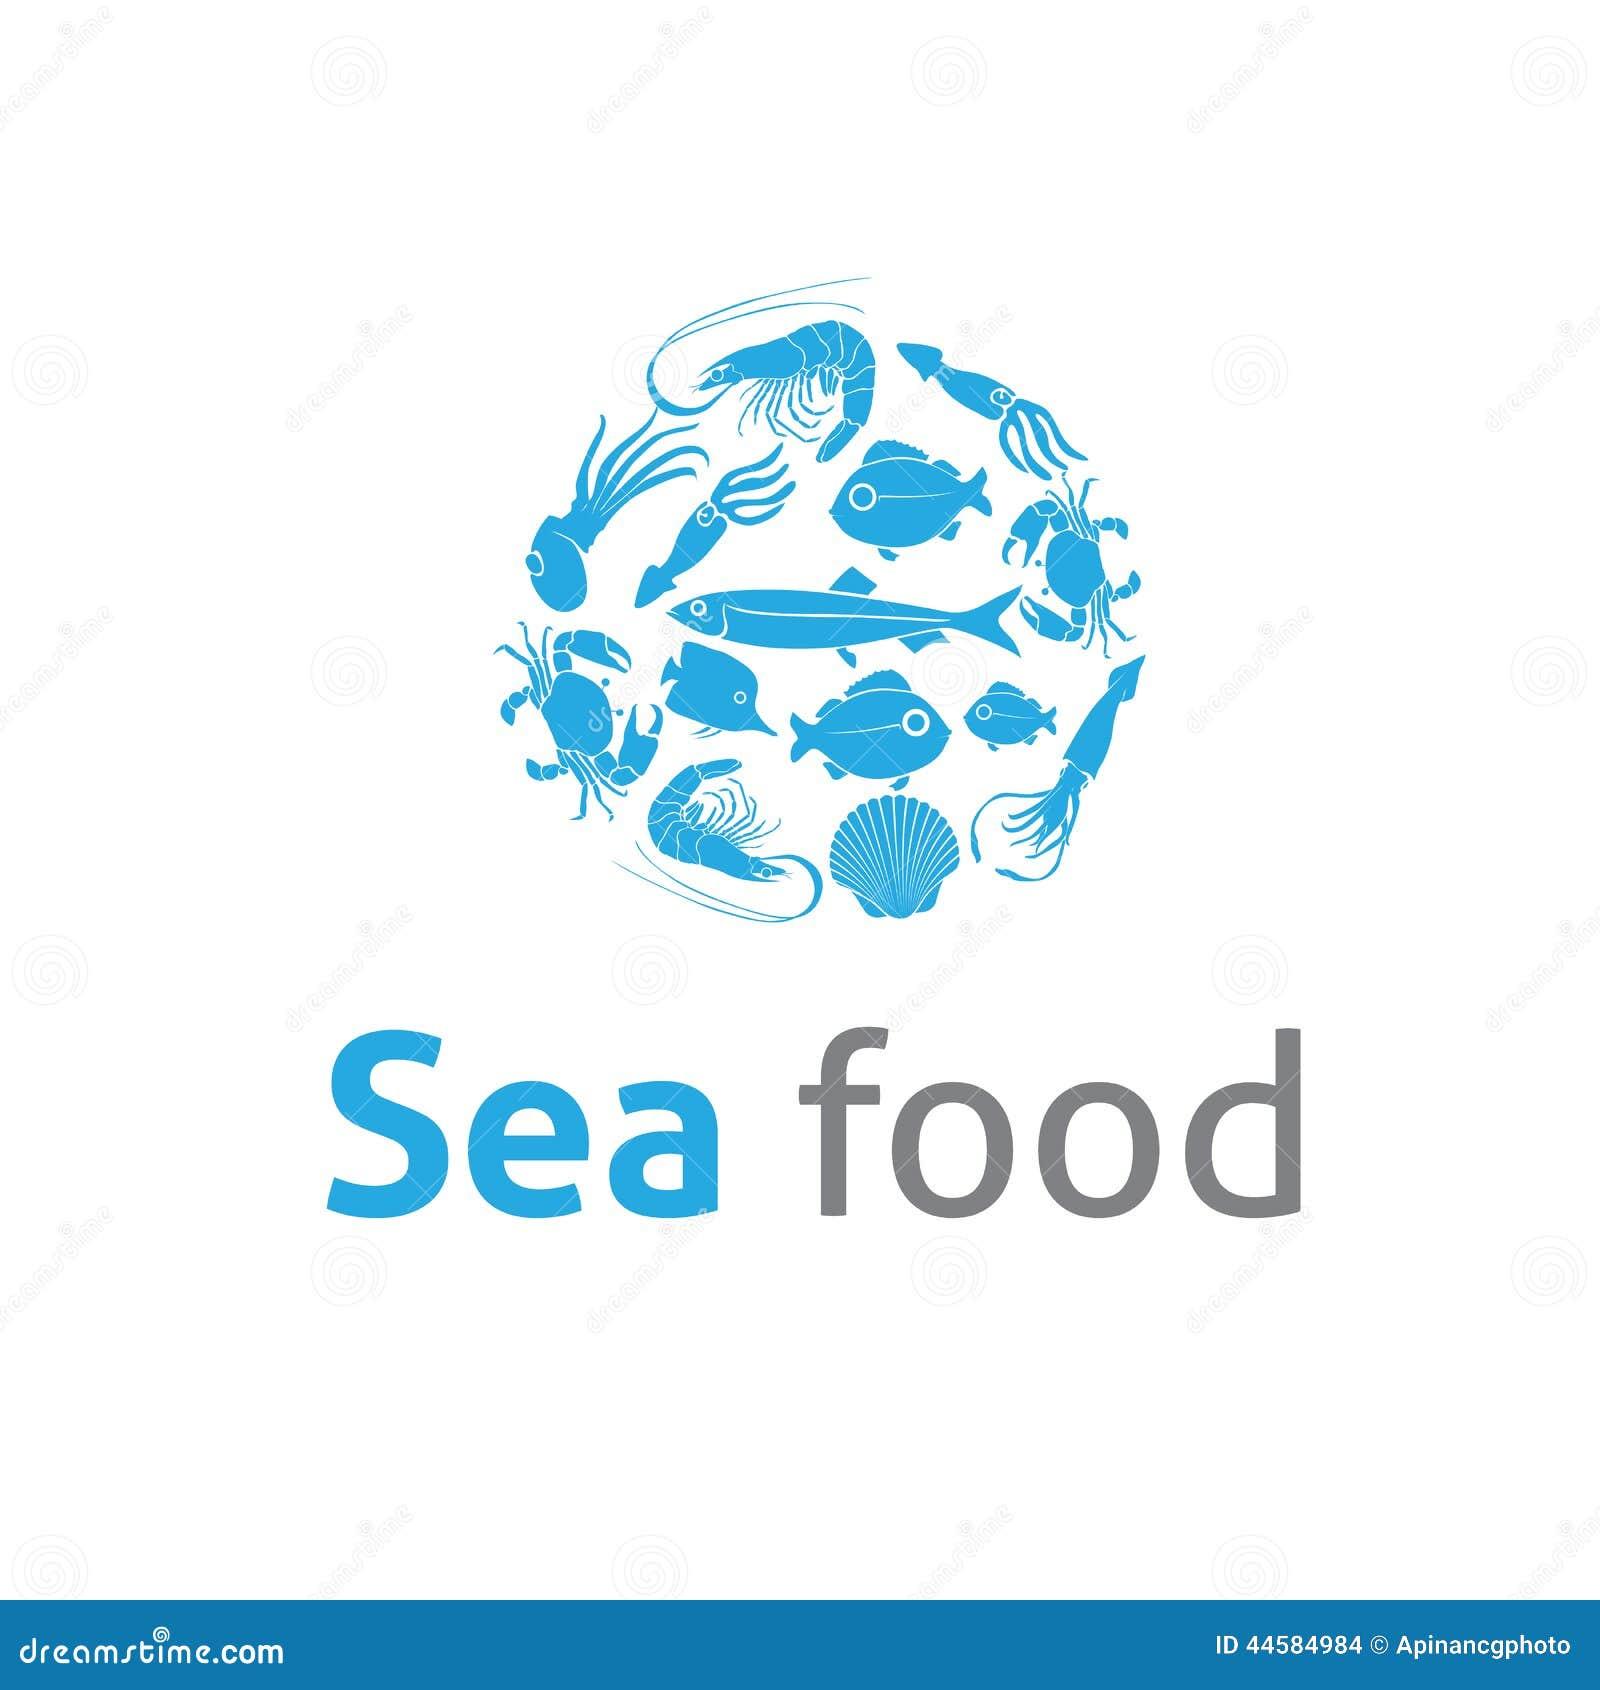 sea food restaurants logo vector template stock vector illustration of seafood  shrimp 44584984 crab vector art crab vector silhouette